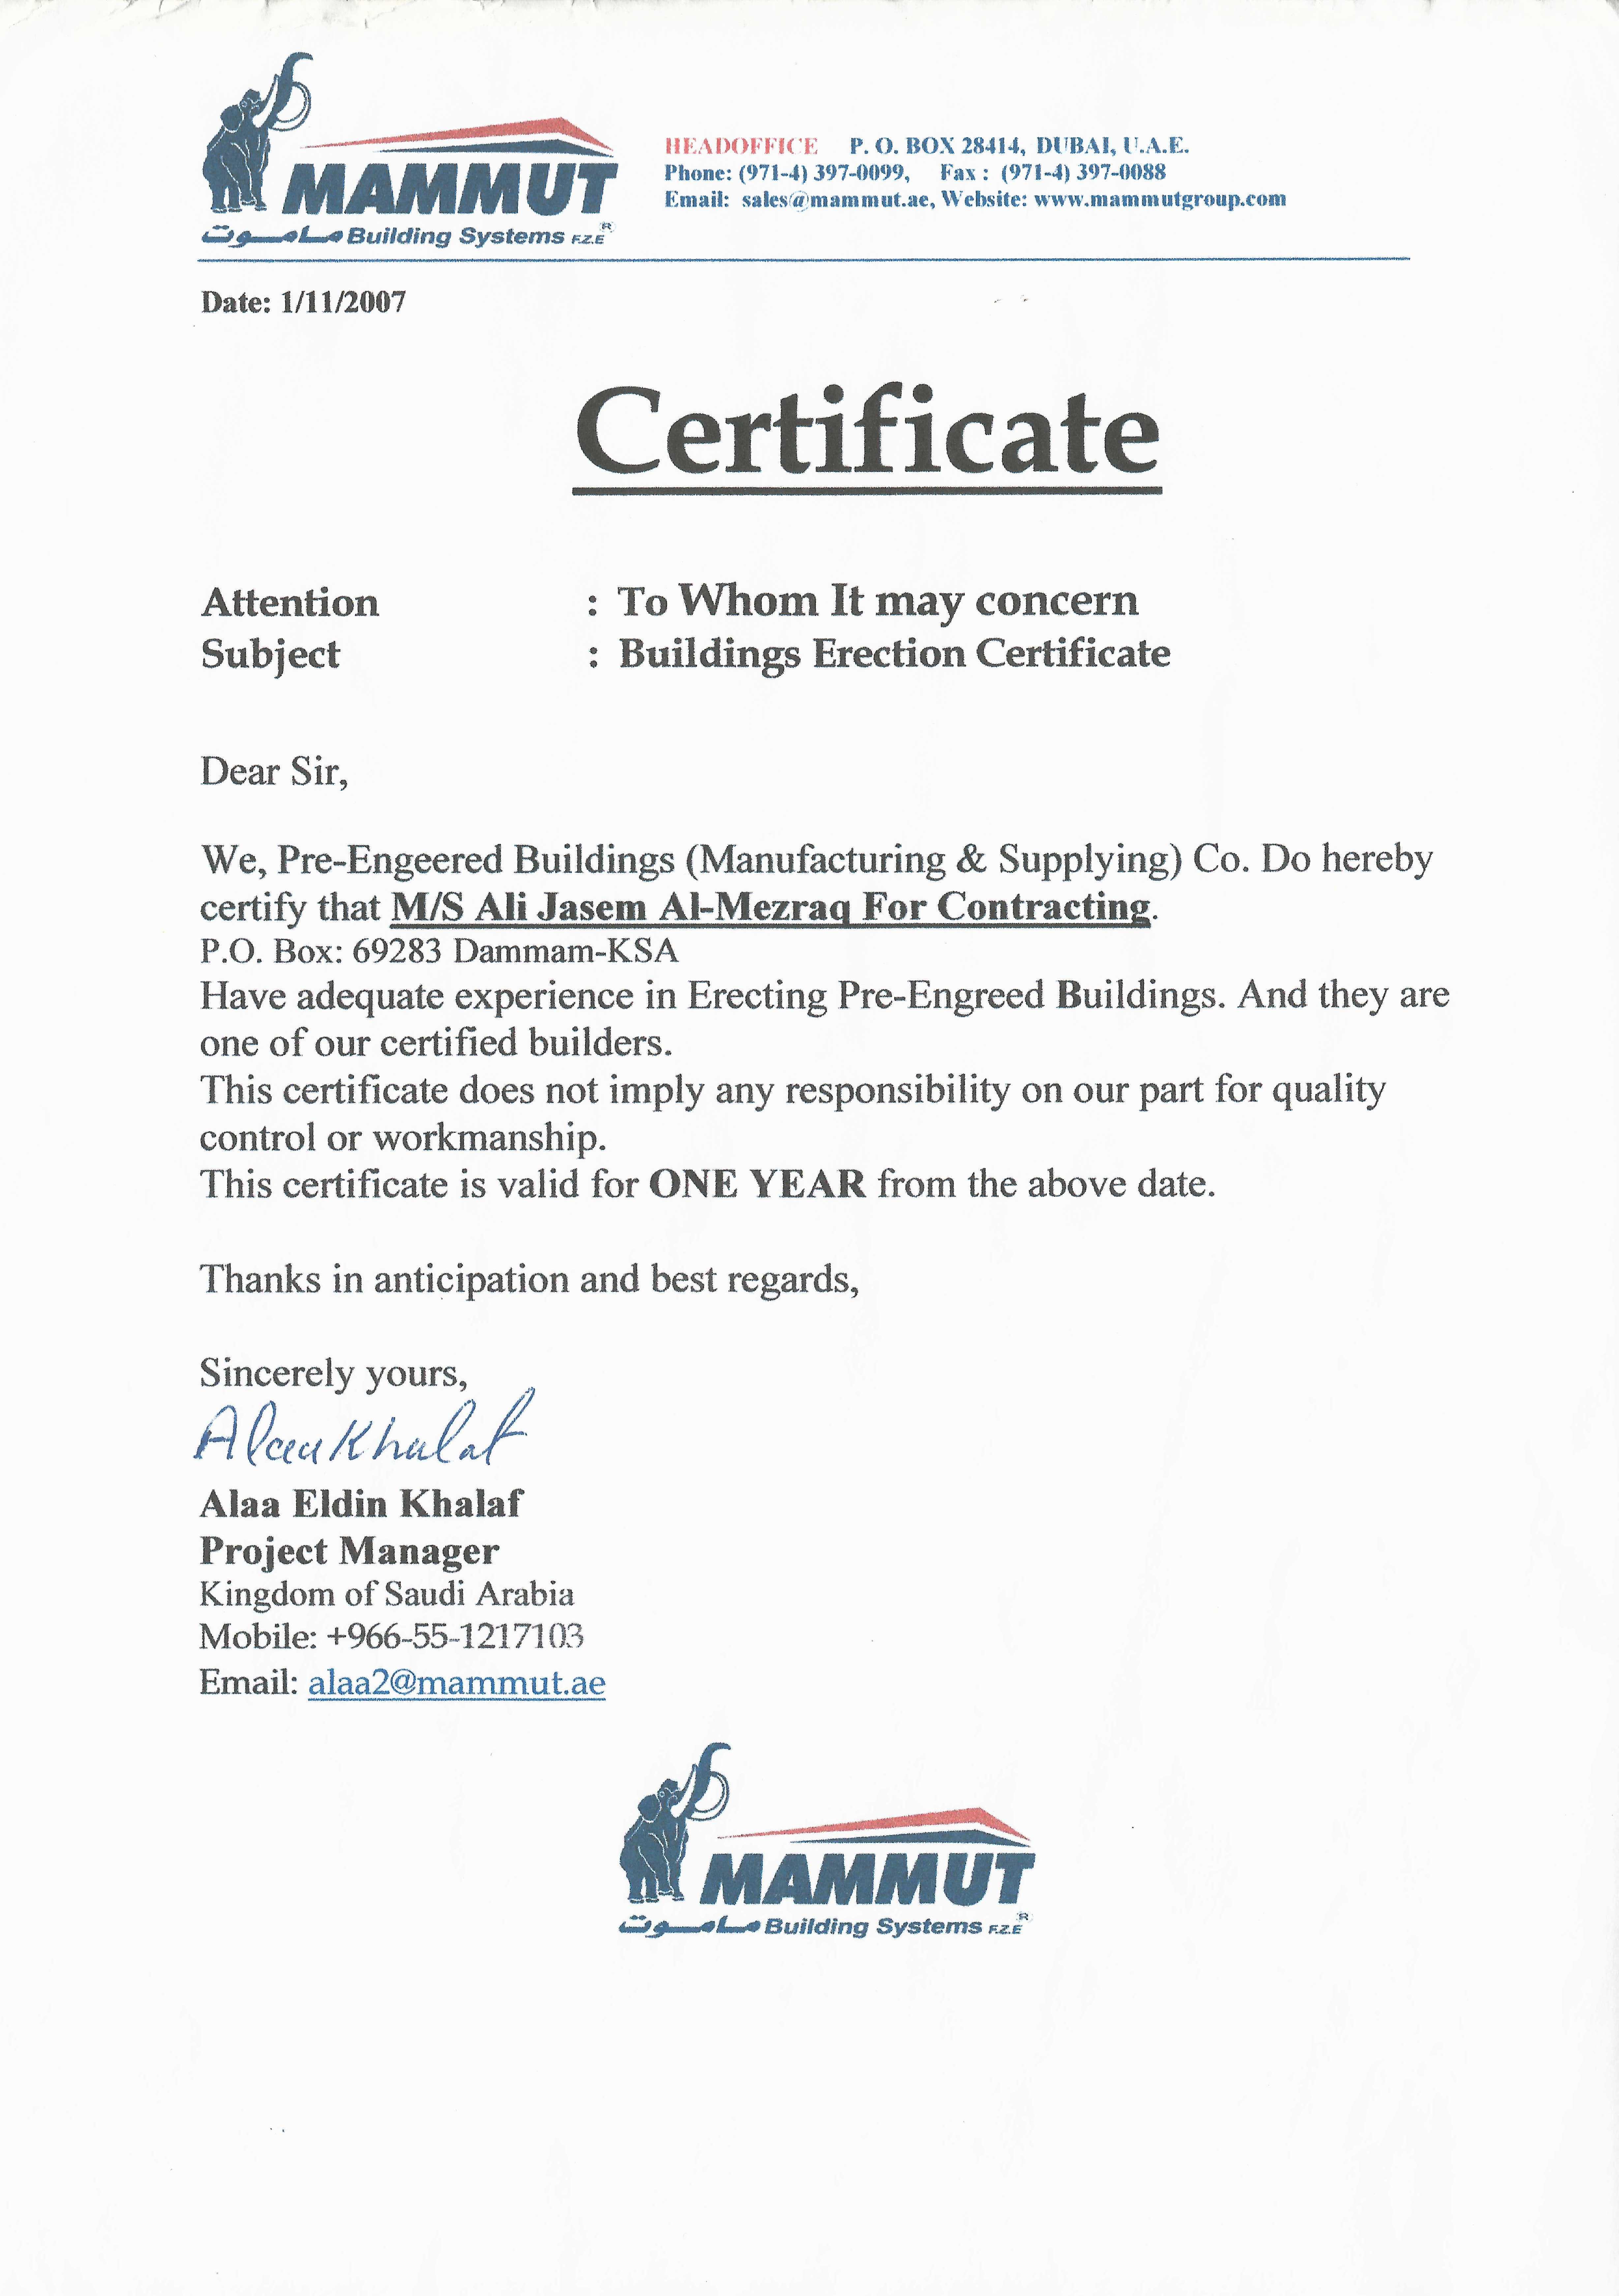 Mamaut Certificate